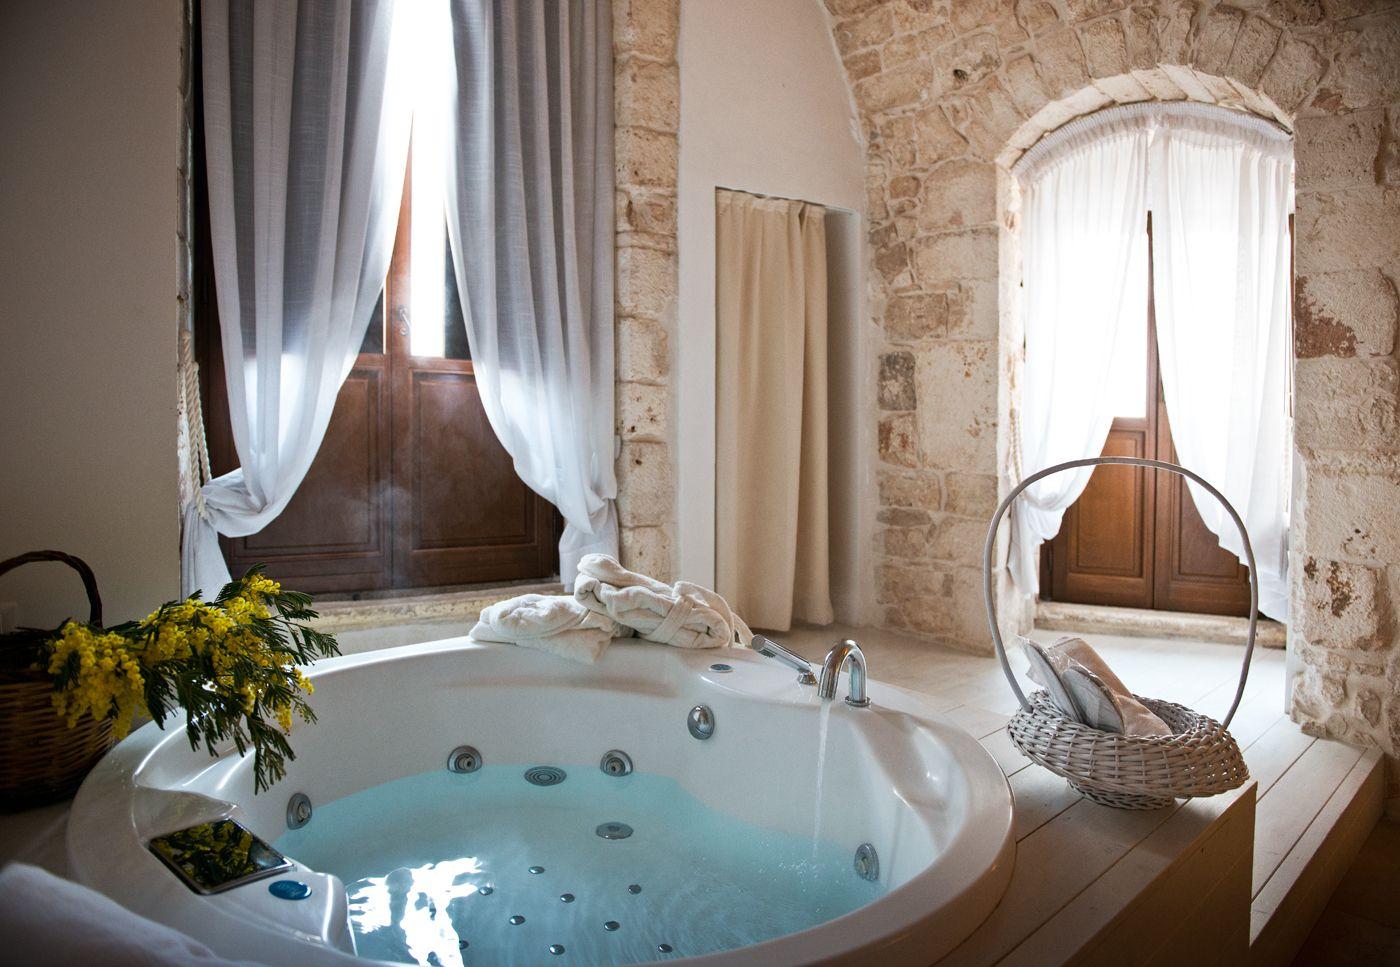 Cerchi idee per un weekend romantico? Niente di meglio che una suite ...